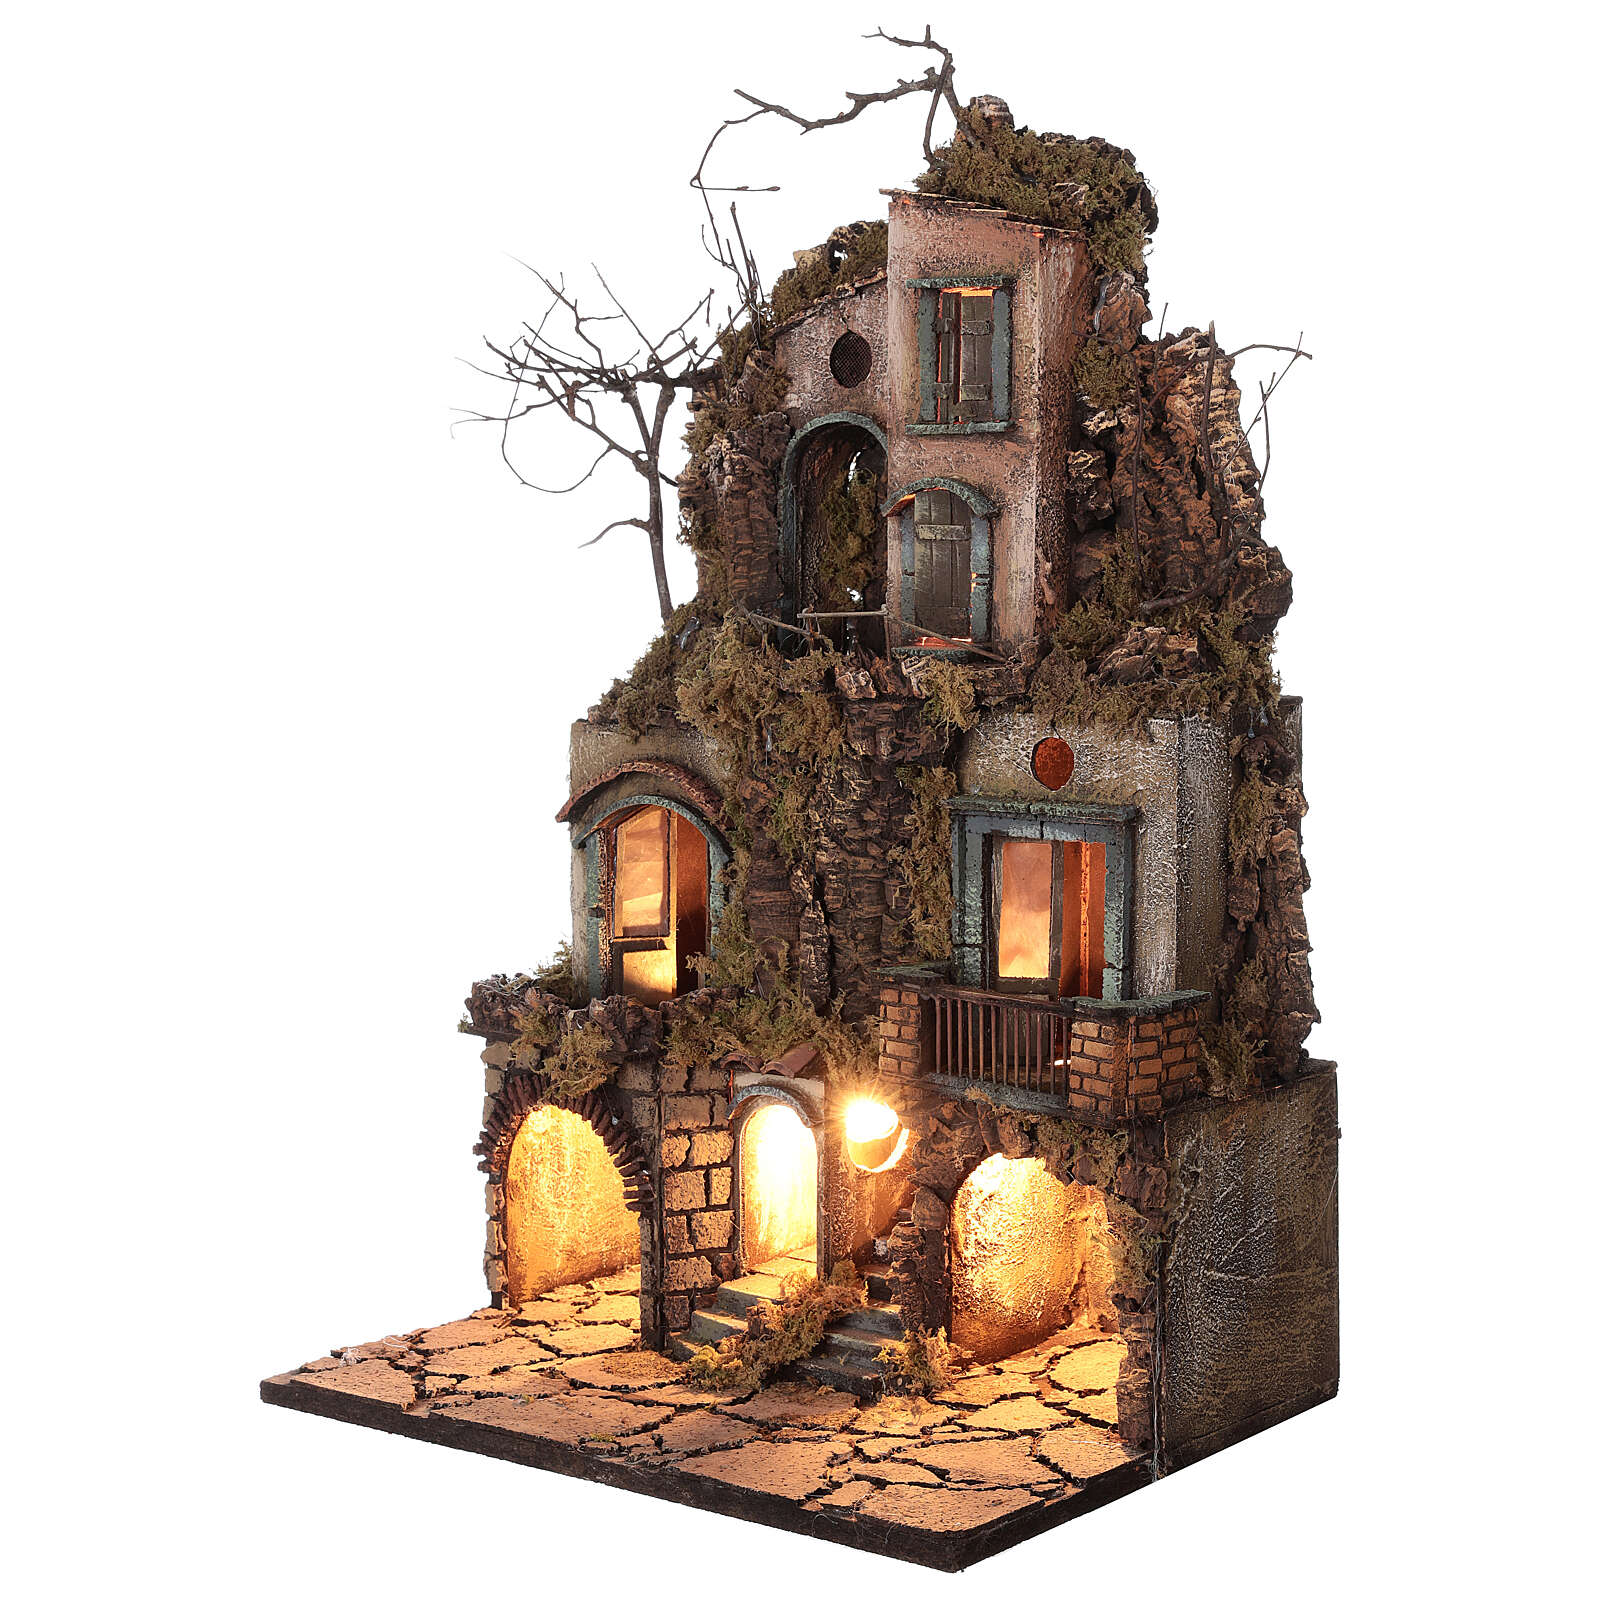 Illuminated village moss and cork 70x40x45 cm Neapolitan Nativity Scene for figurines of 10 cm average height 4